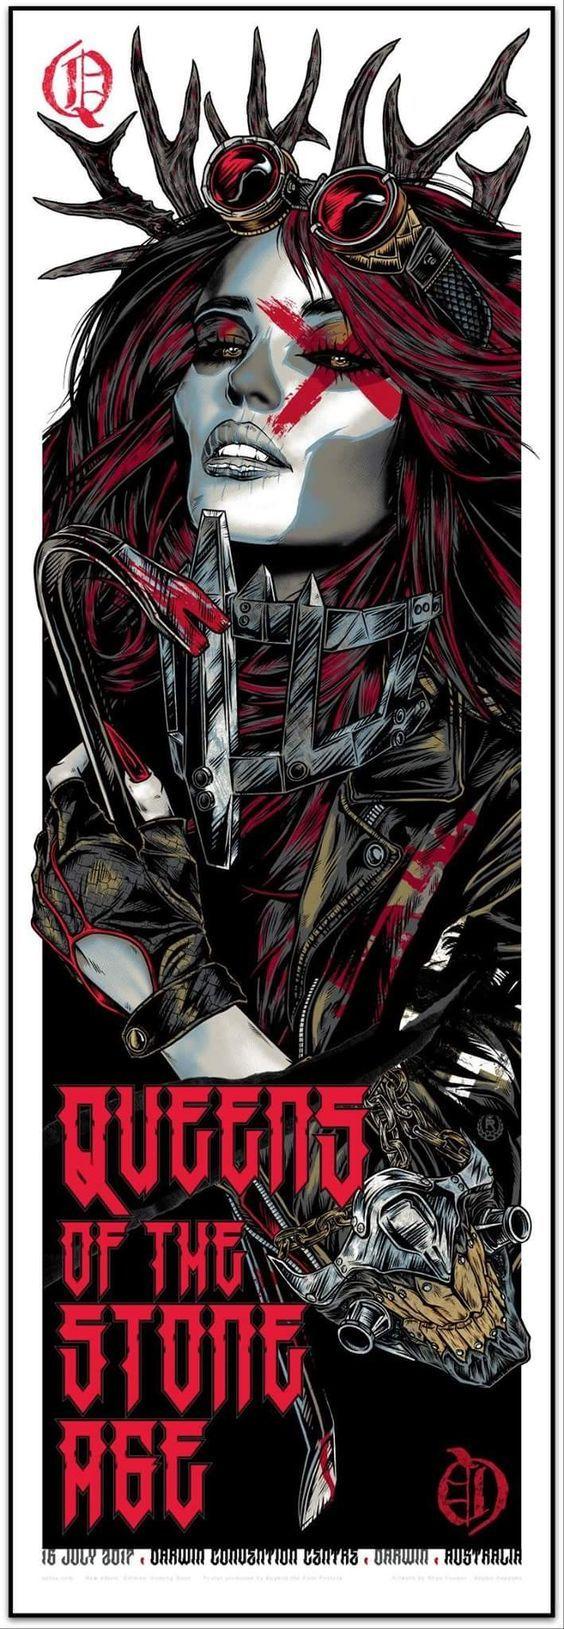 Heavy Metal Bands Wallpapers The Joker Harley Quinn